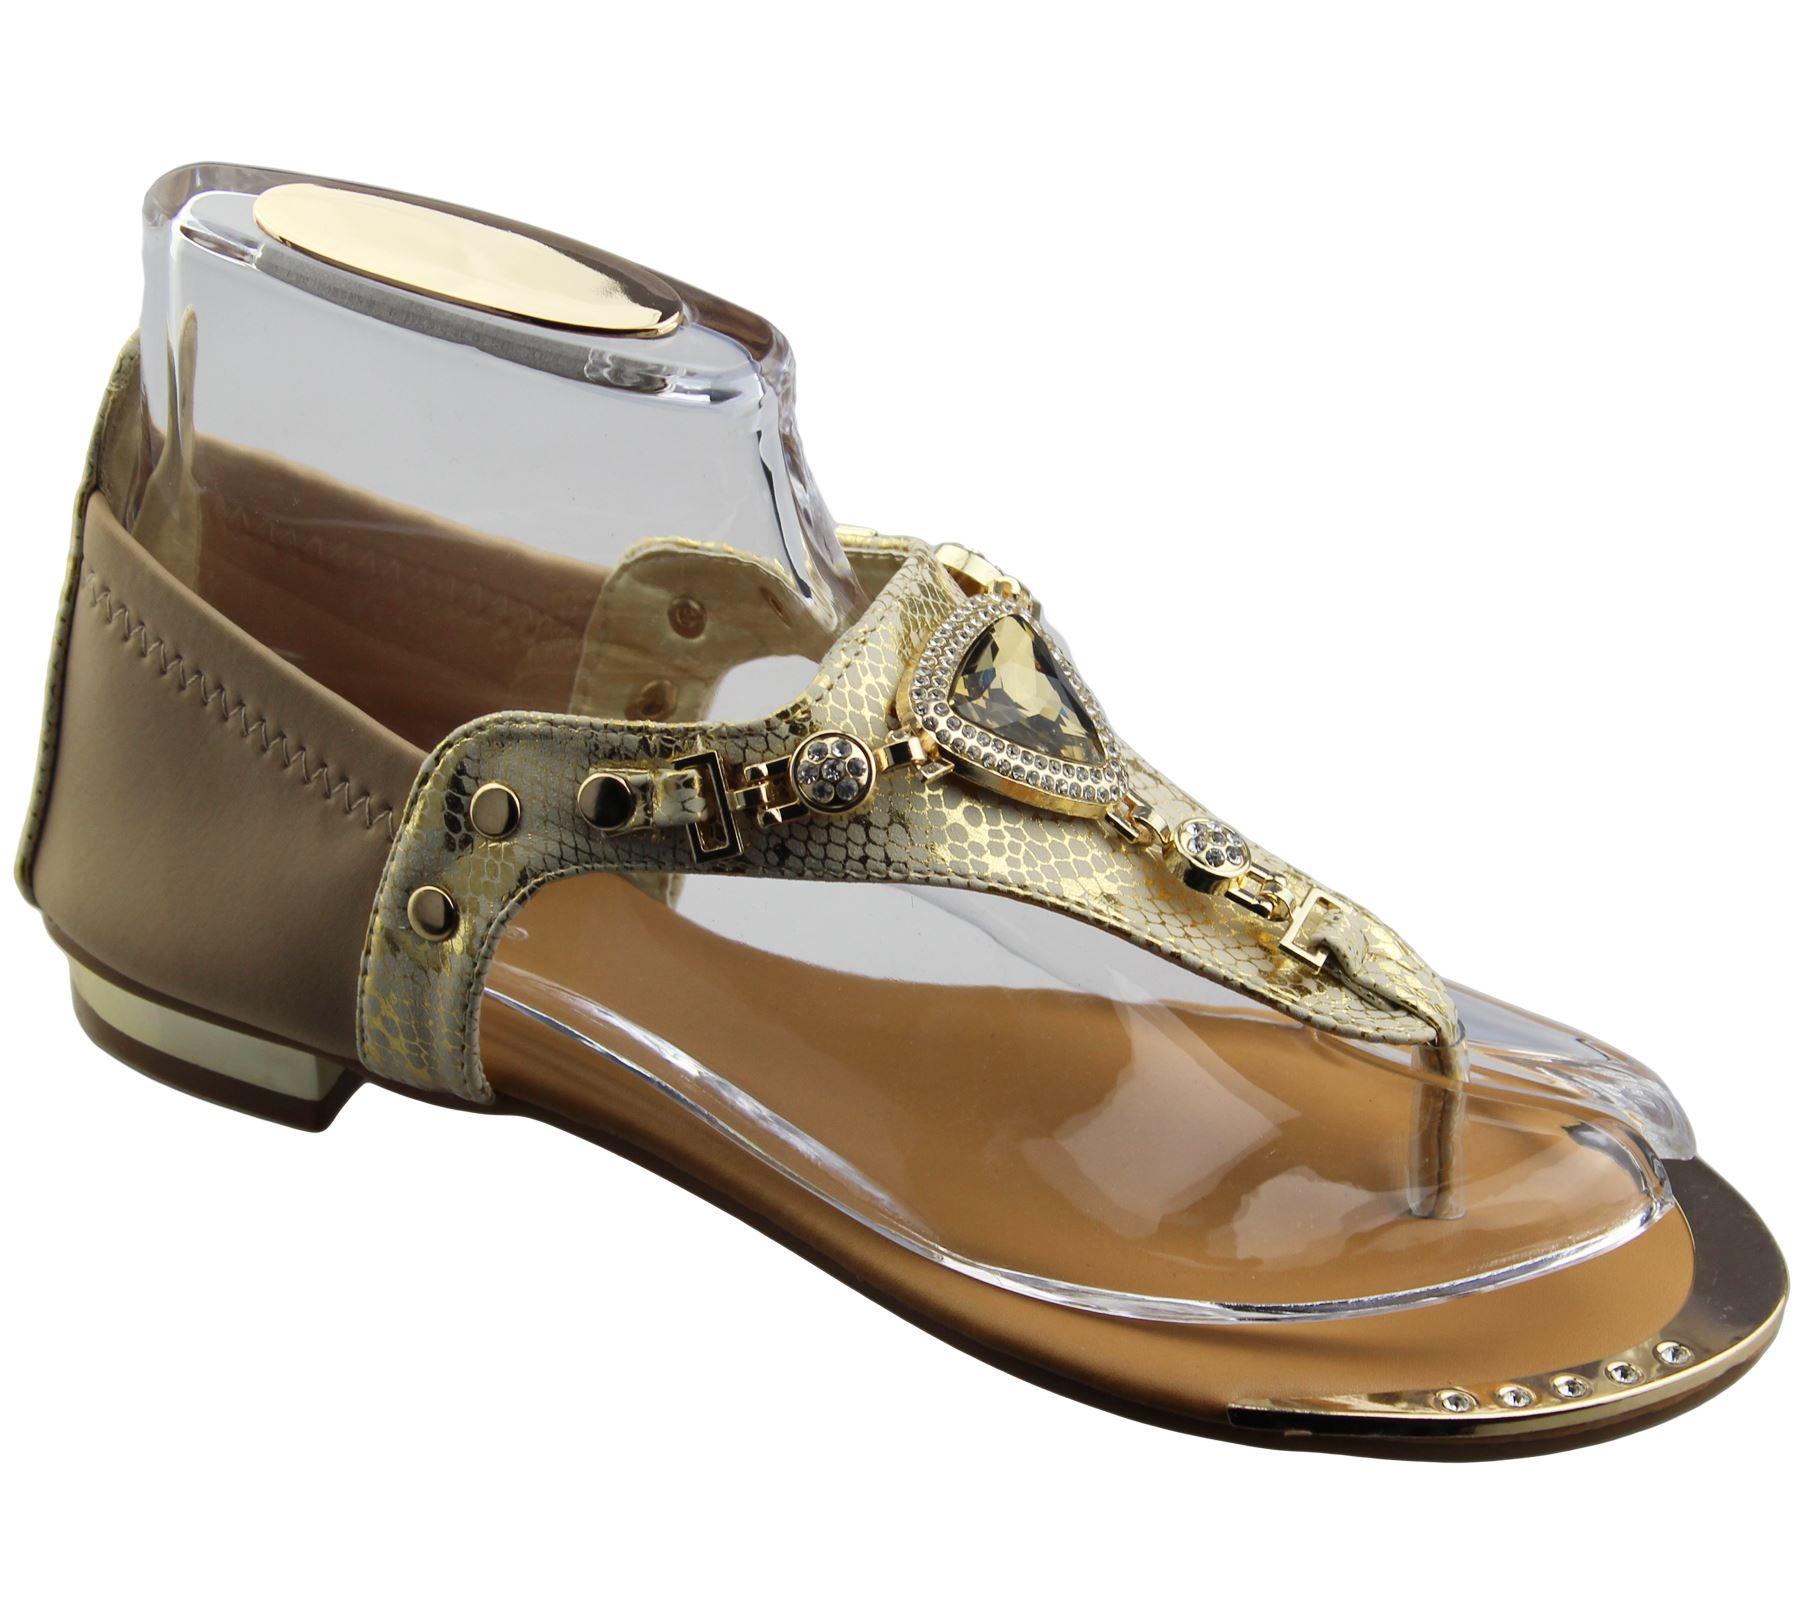 Womens-Flat-Summer-Sandals-Ladies-Diamante-Wedding-Toe-Post-Casual-Slipper thumbnail 21